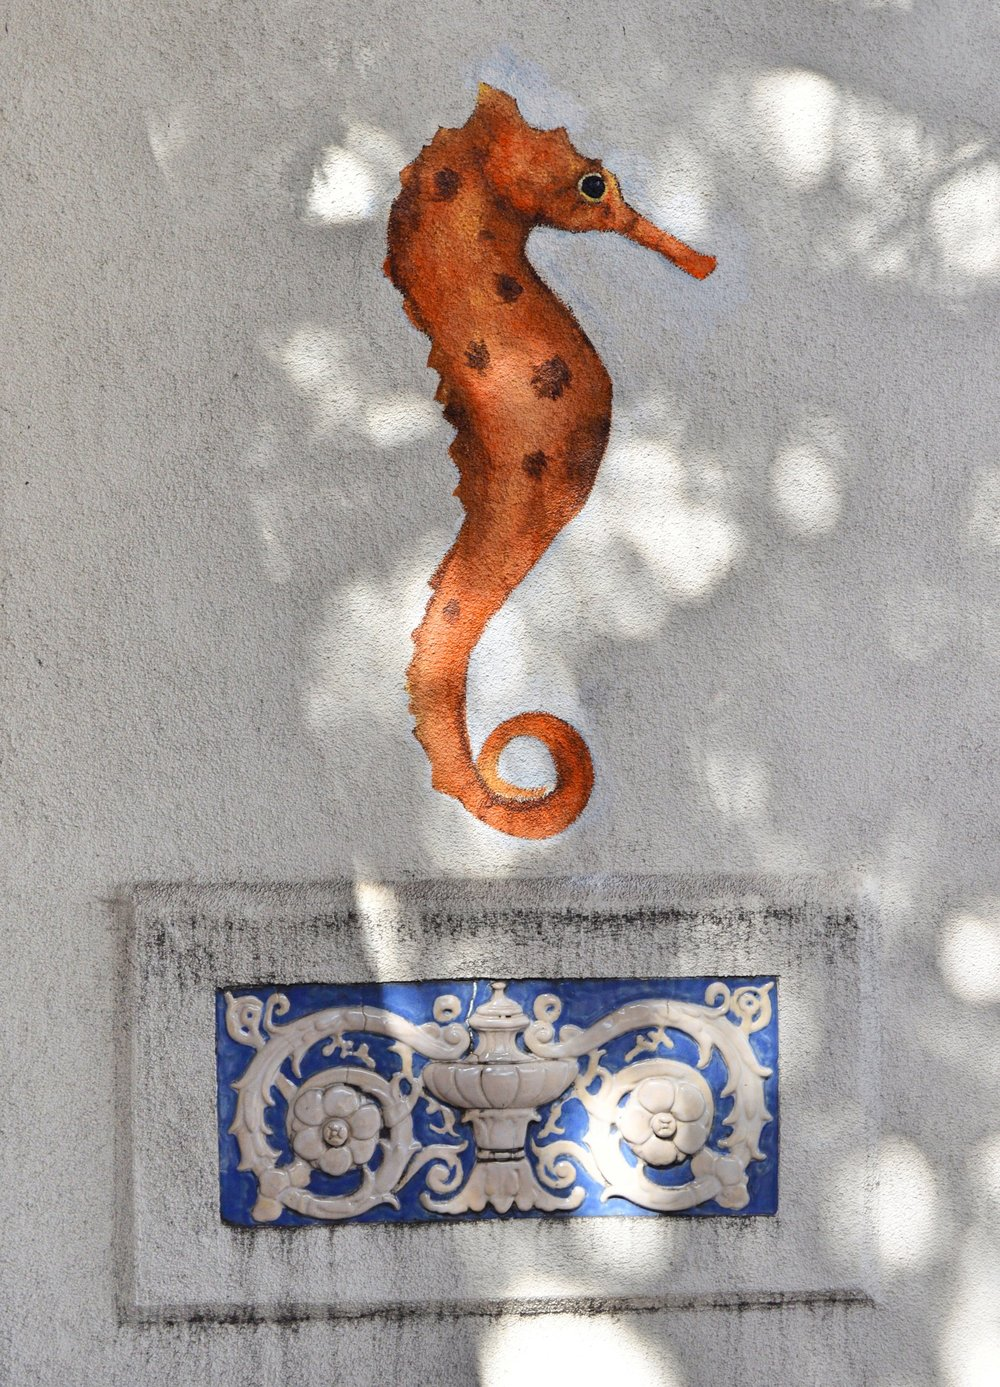 Sloat Murals Caballito1_Fotor.jpg